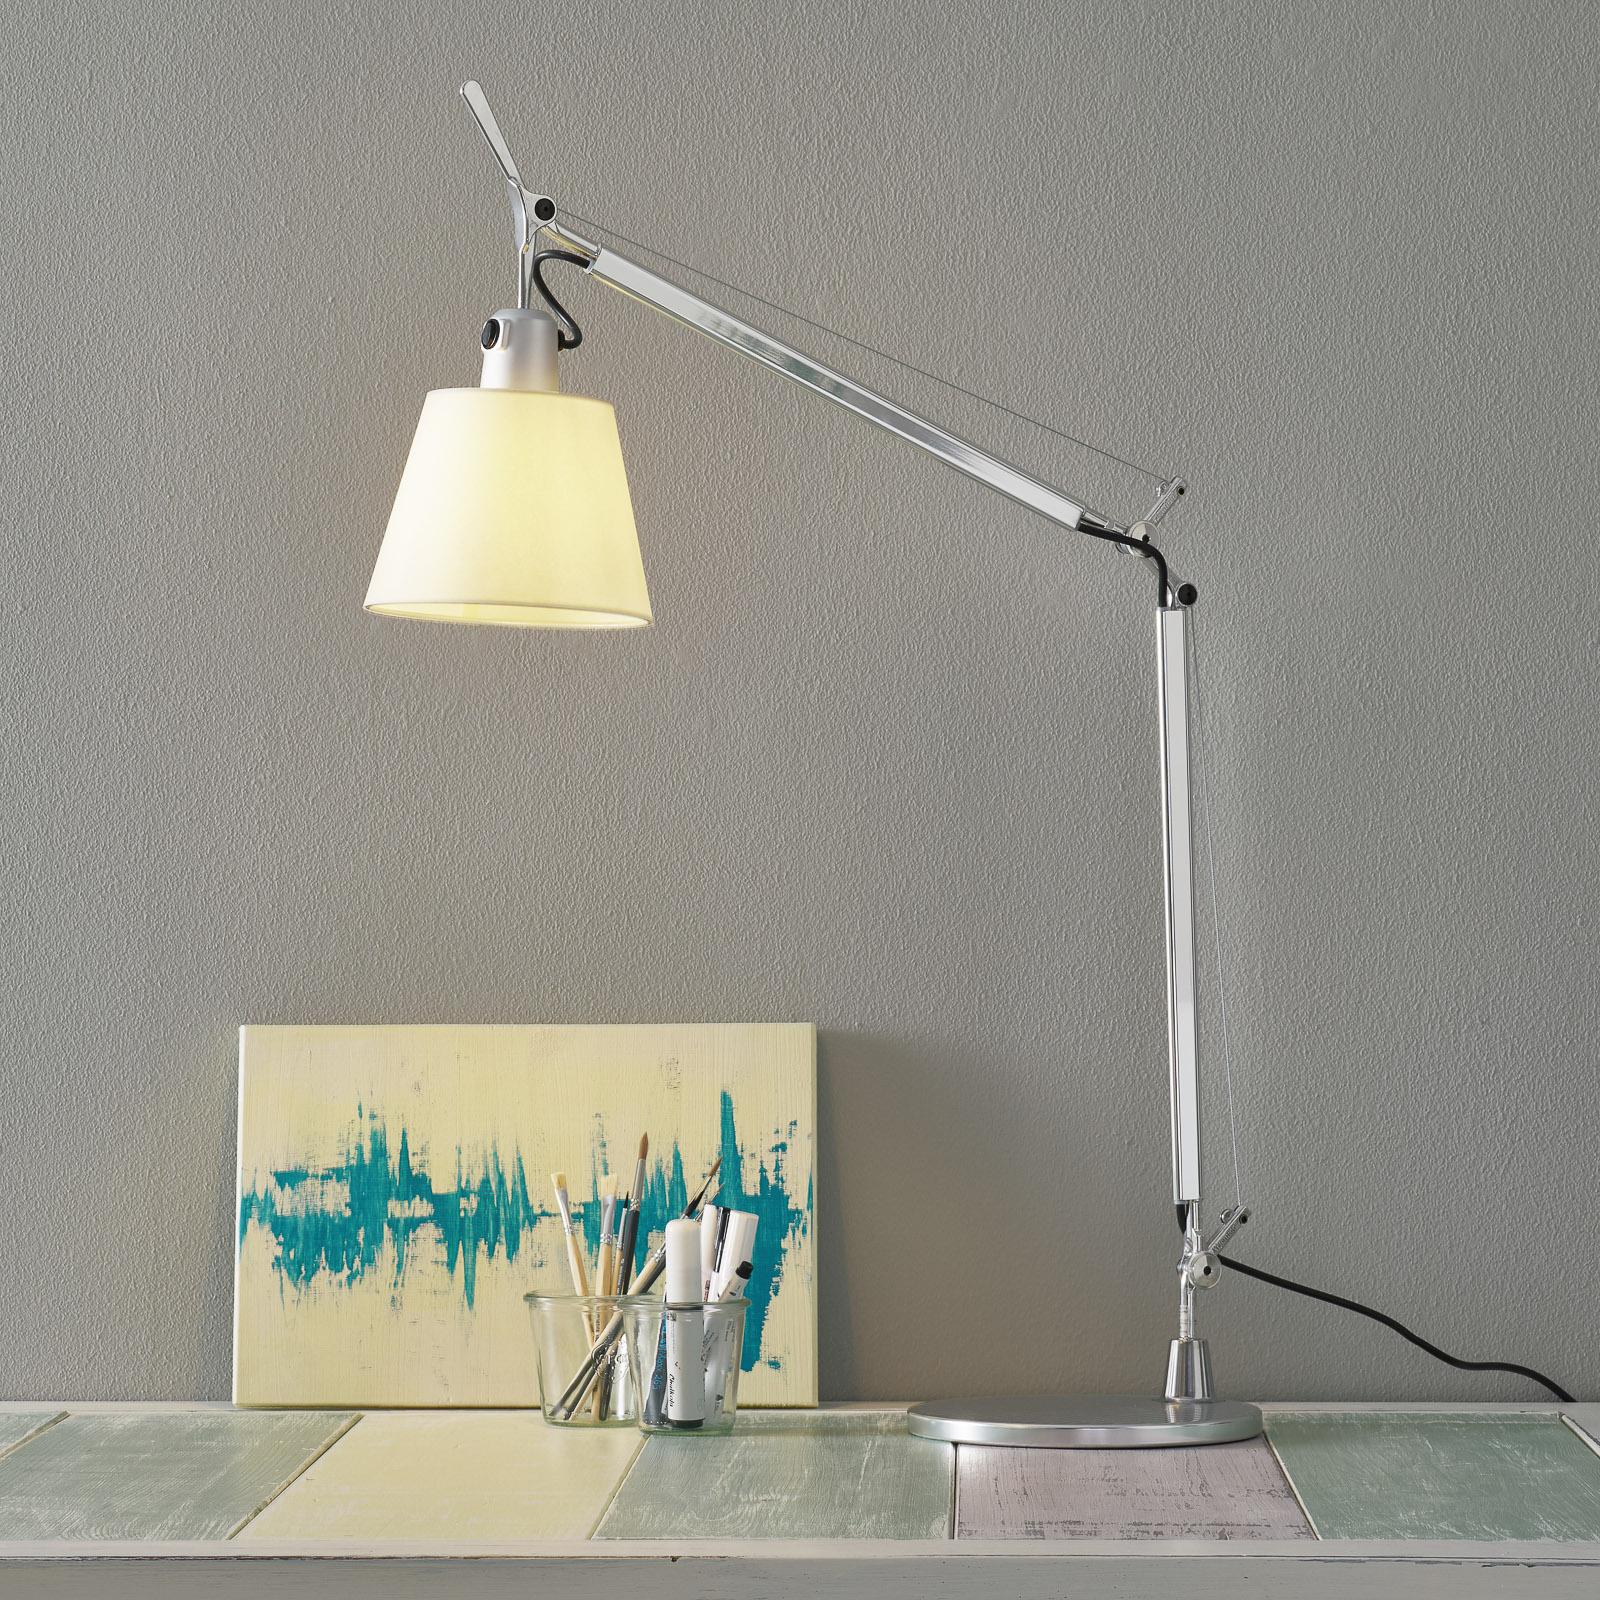 Designer-bordslampa Tolomeo Basculante